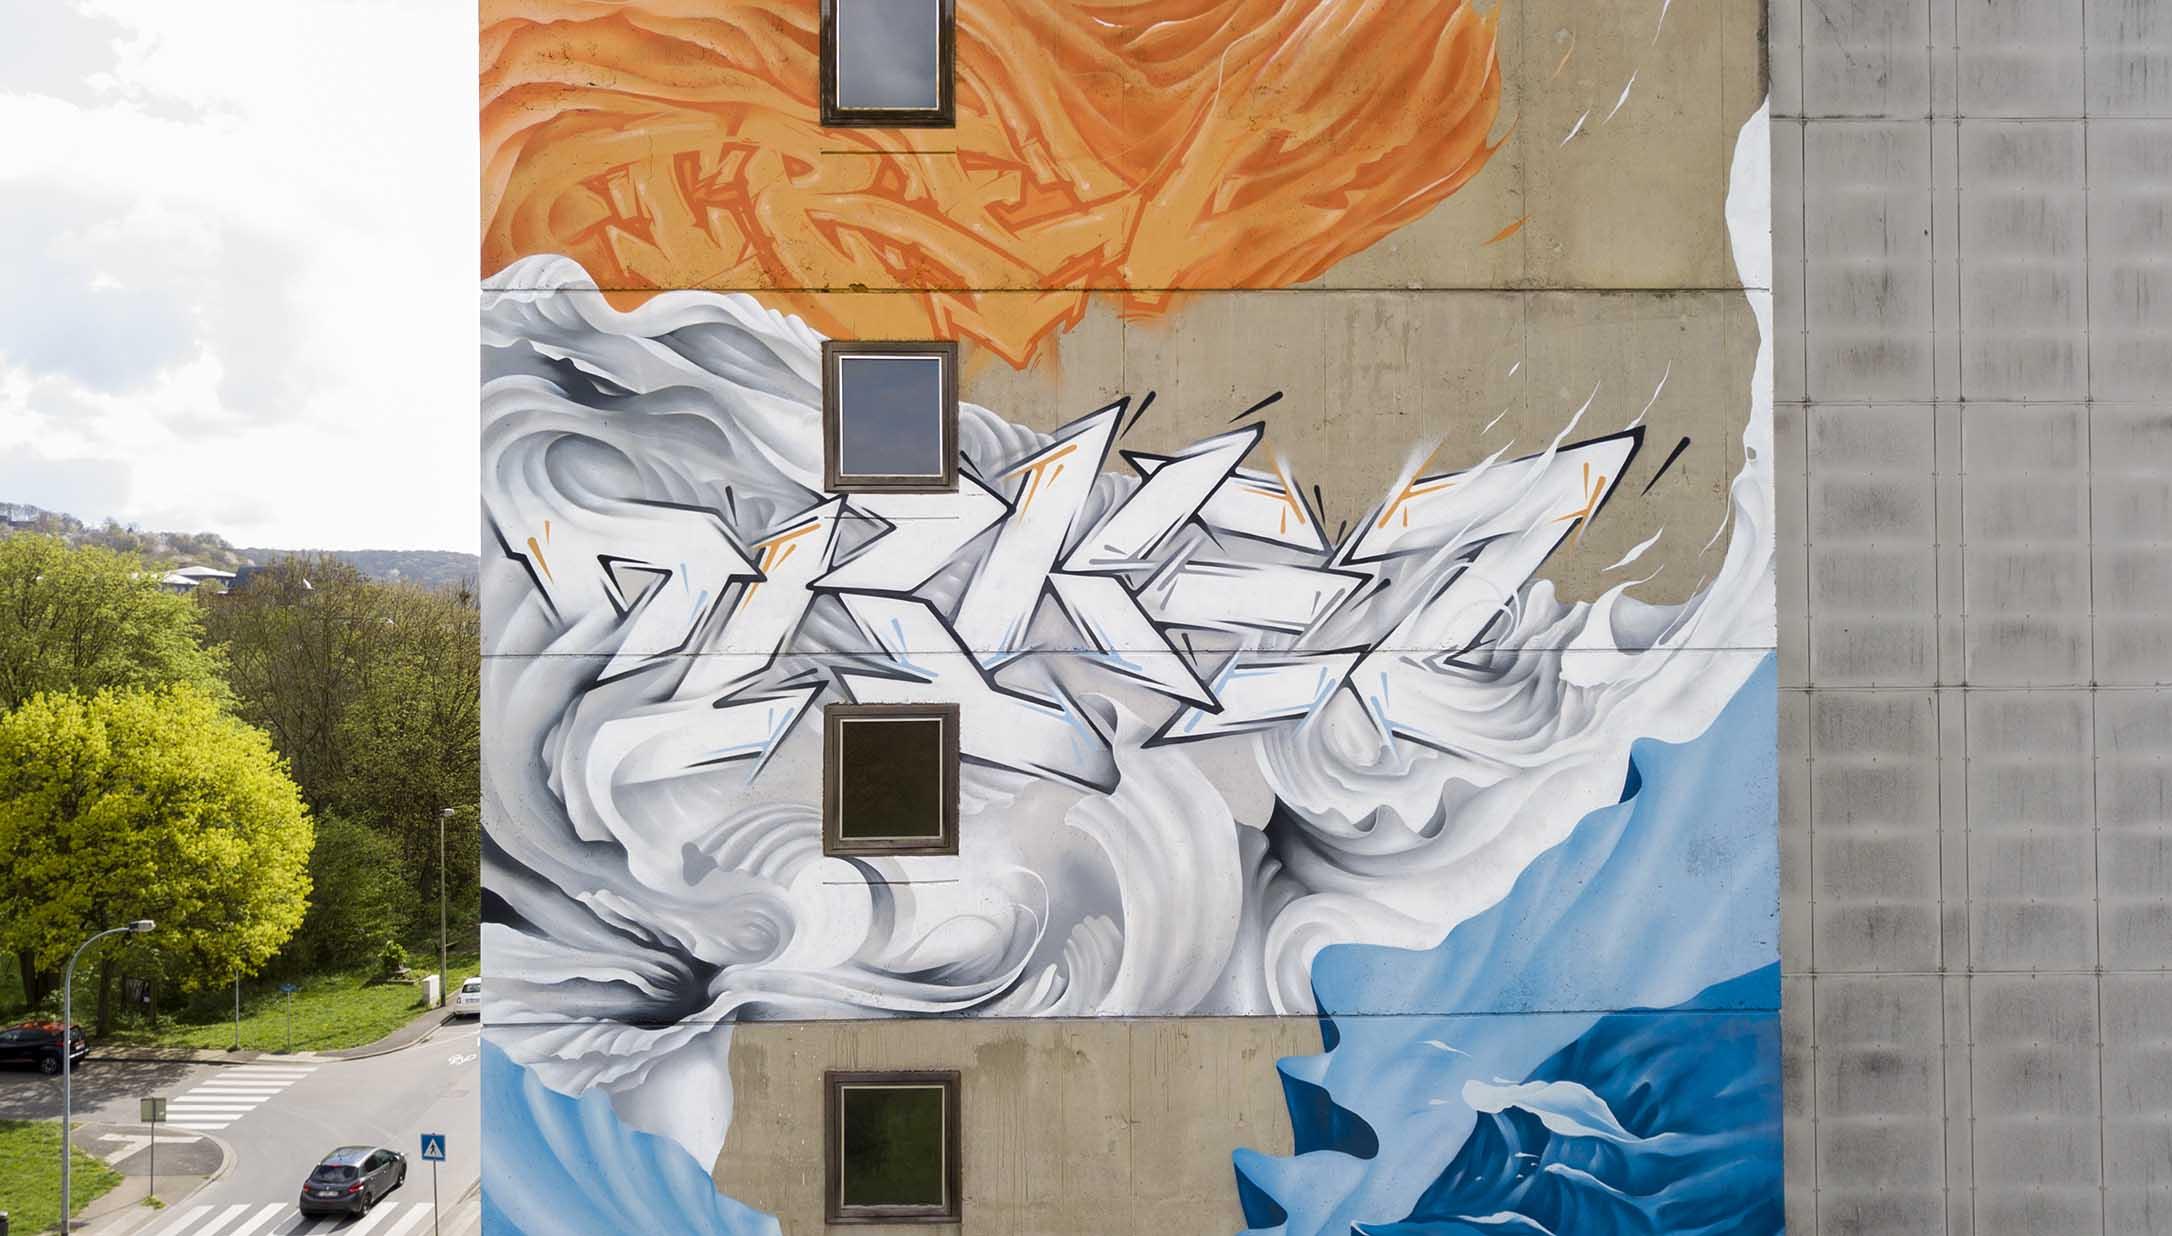 https://www.propaganza.be/wp-content/uploads/2016/05/propaganza-graffiti-street-art-belgium-belgique-roubens-orkez-trevor-namur-2018-1.jpg